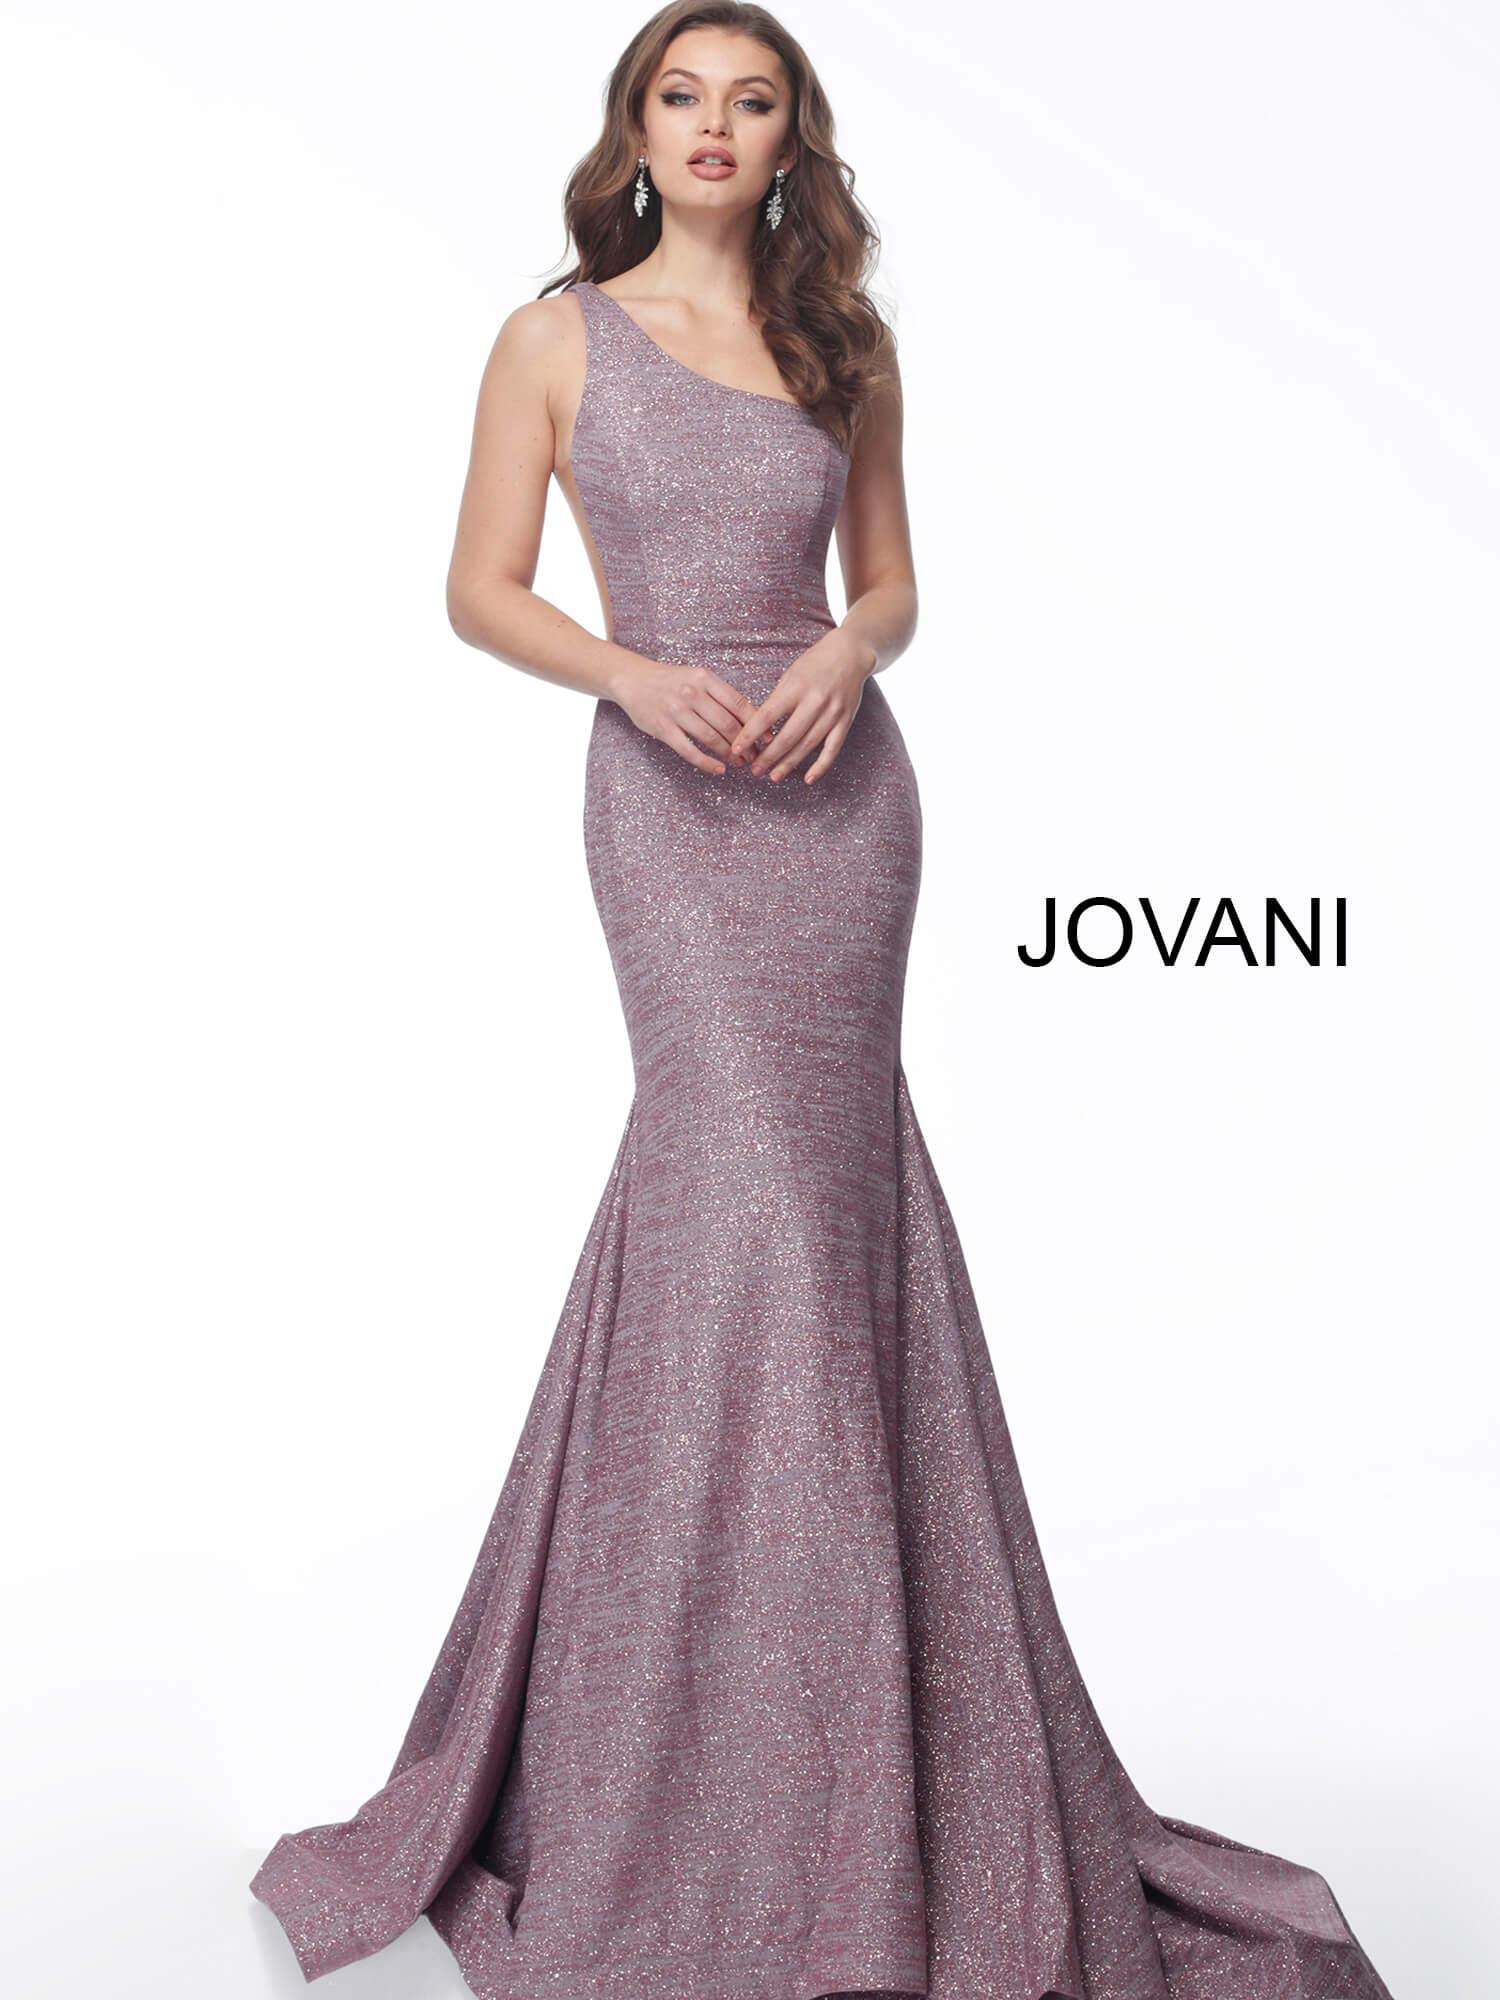 One Shoulder Stretch Glitter Prom Dress